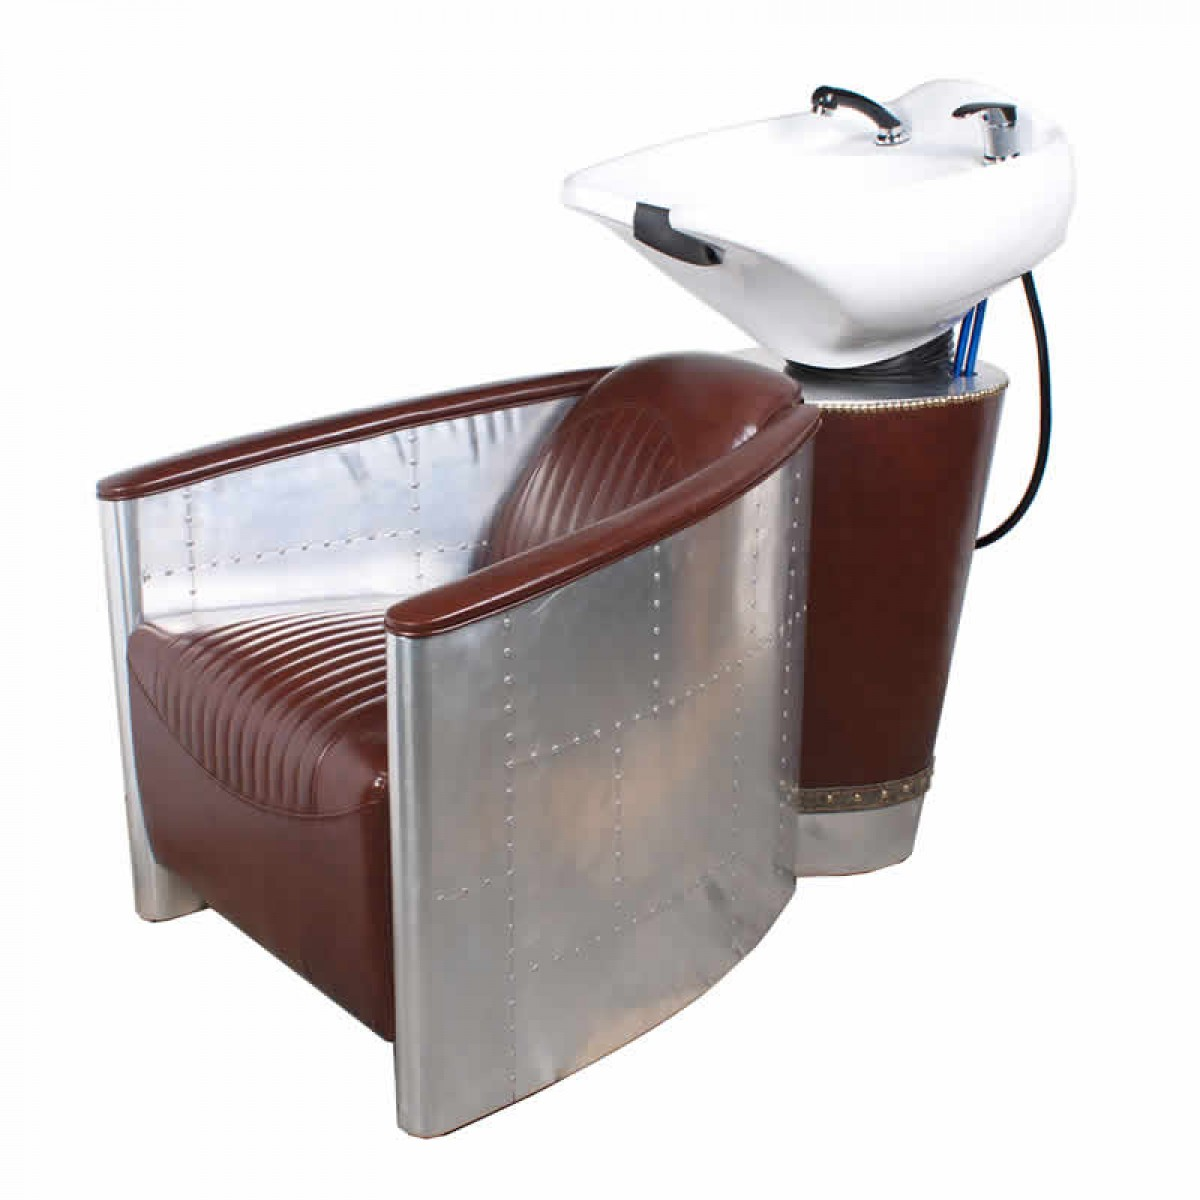 """AVIATOR"" Vintage Shampoo Backwash Unit in Aluminum - Min order quantity 5 pcs"